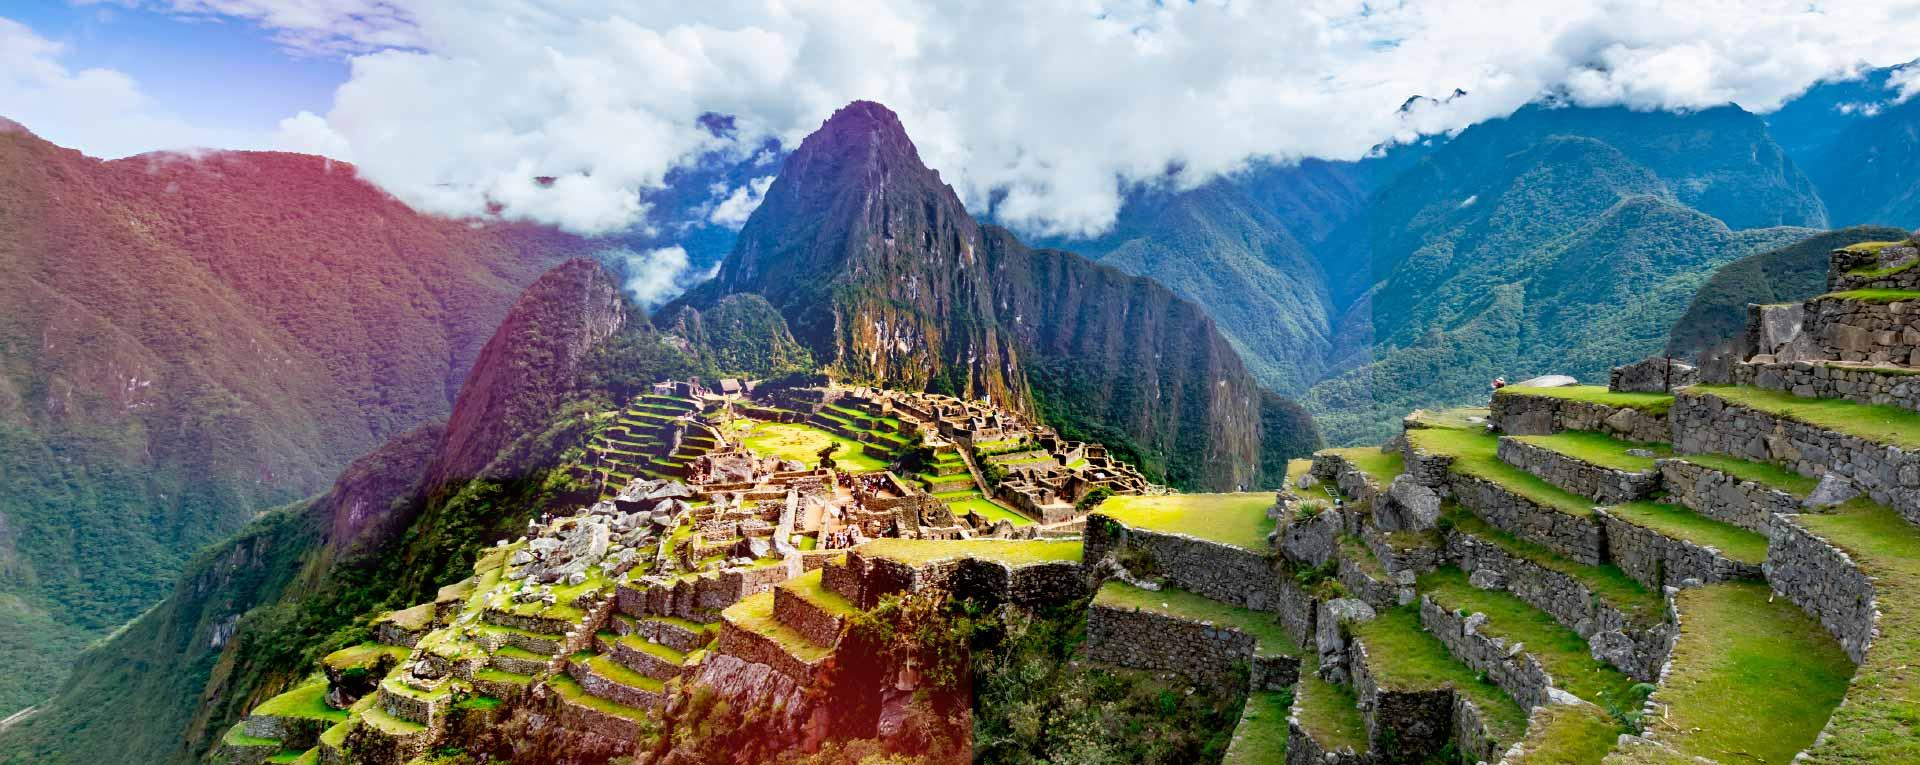 Bloqueo Perú 2020